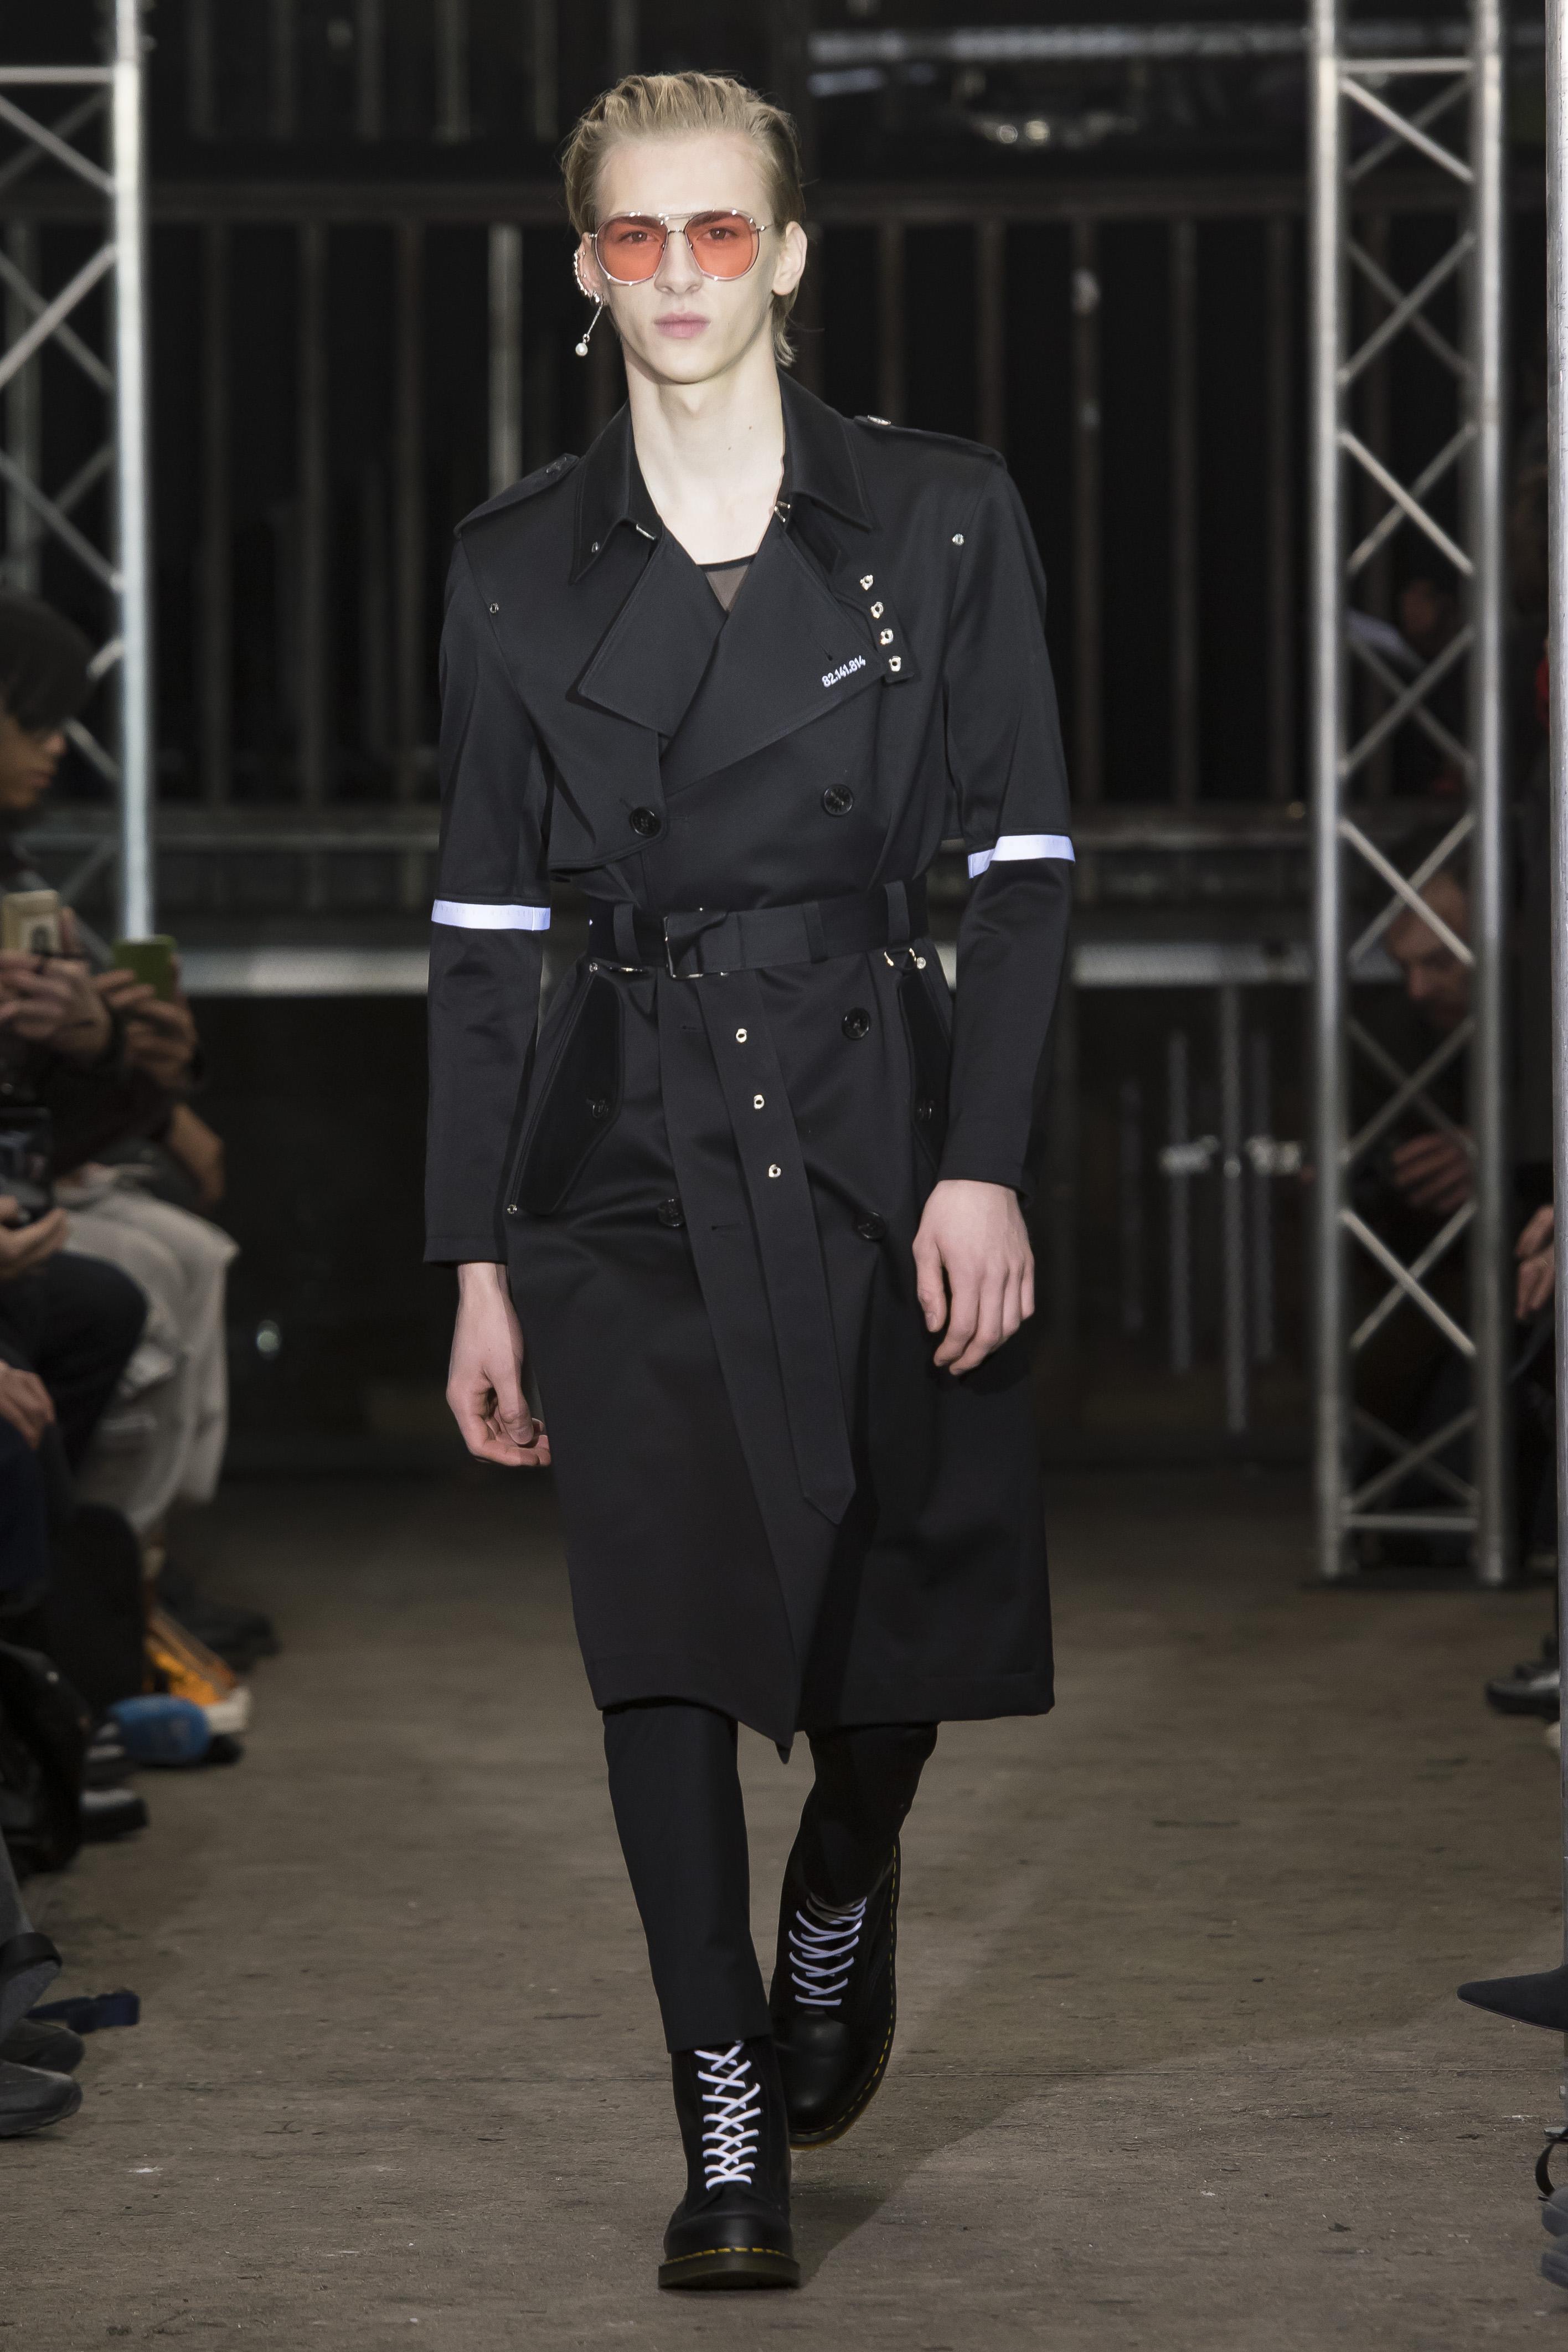 Icosae 融合朋克文化满足时尚幻想